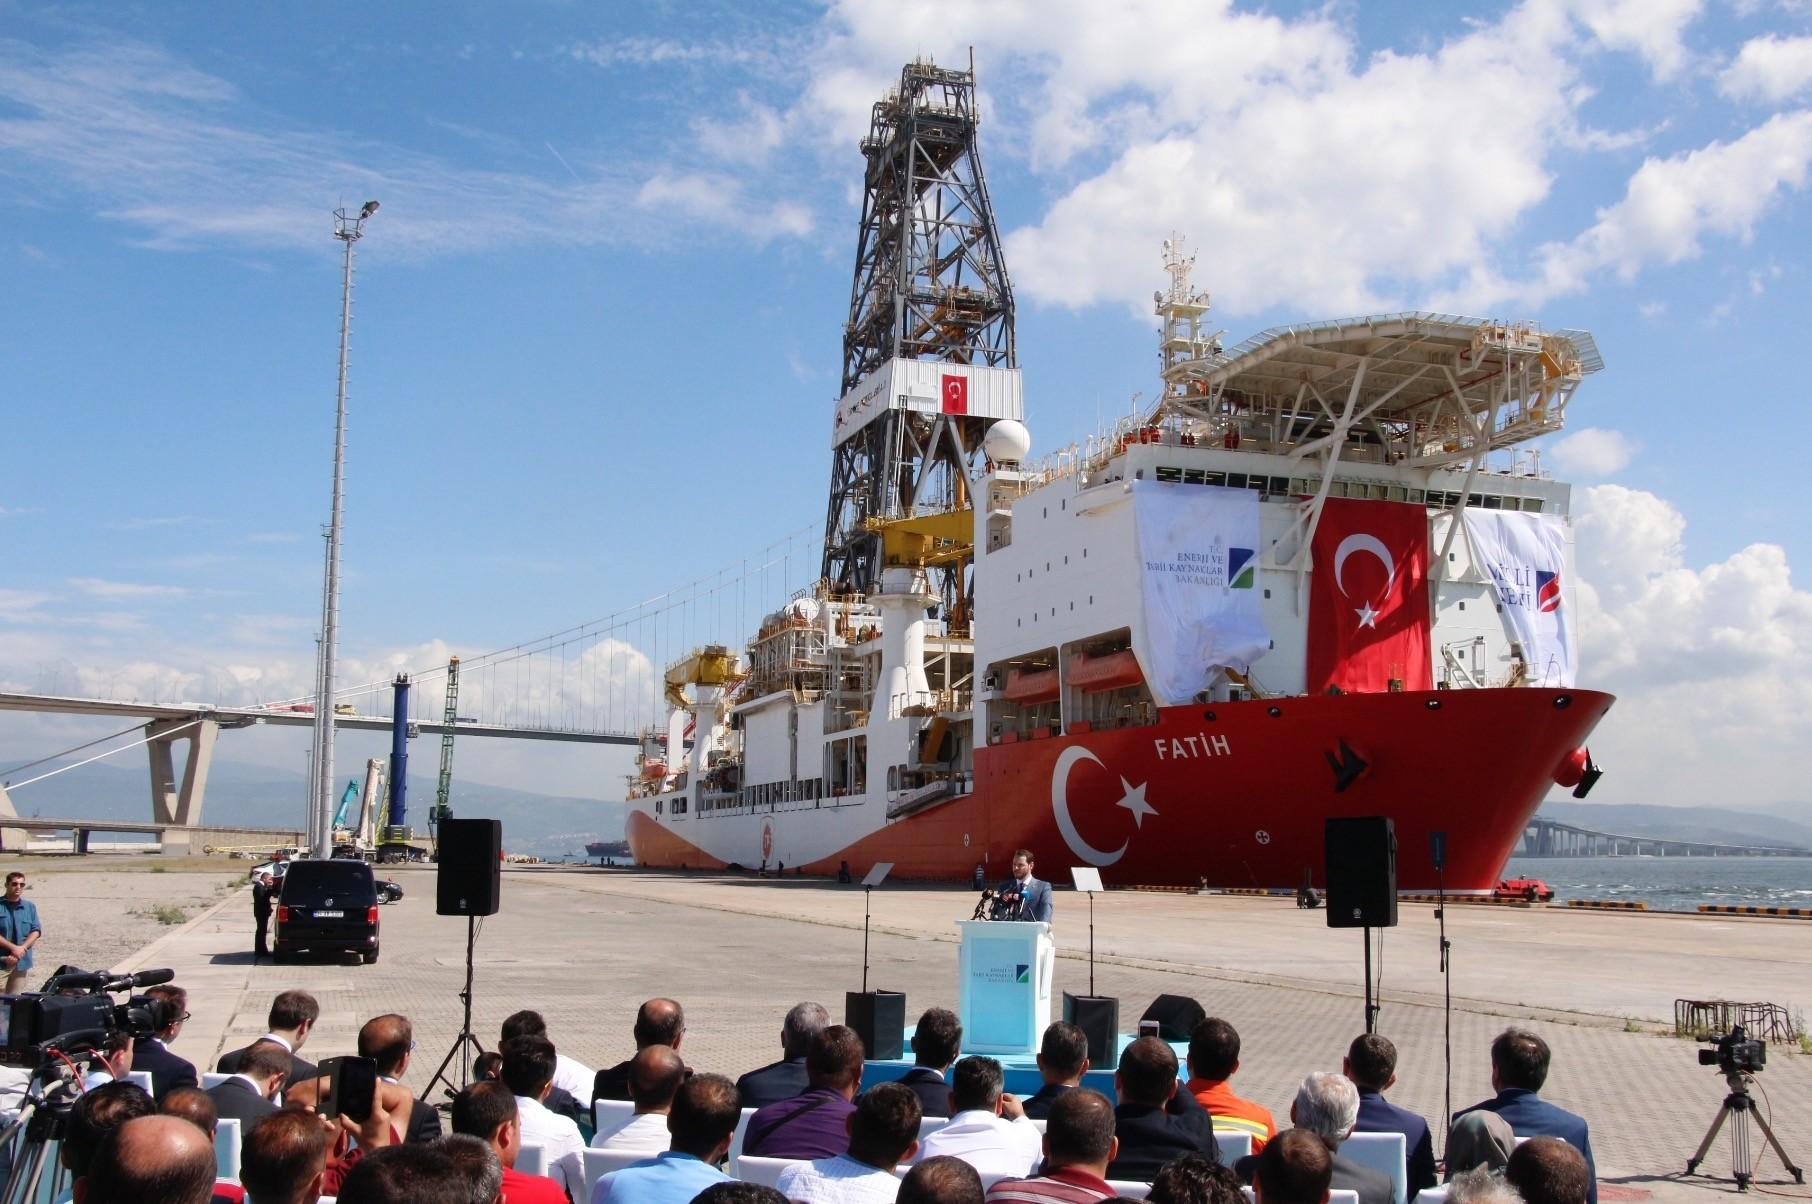 Energy Minister Berat Albayrak addresses press members at the ceremony for Turkeyu2019s first drilling vessel Fatih.